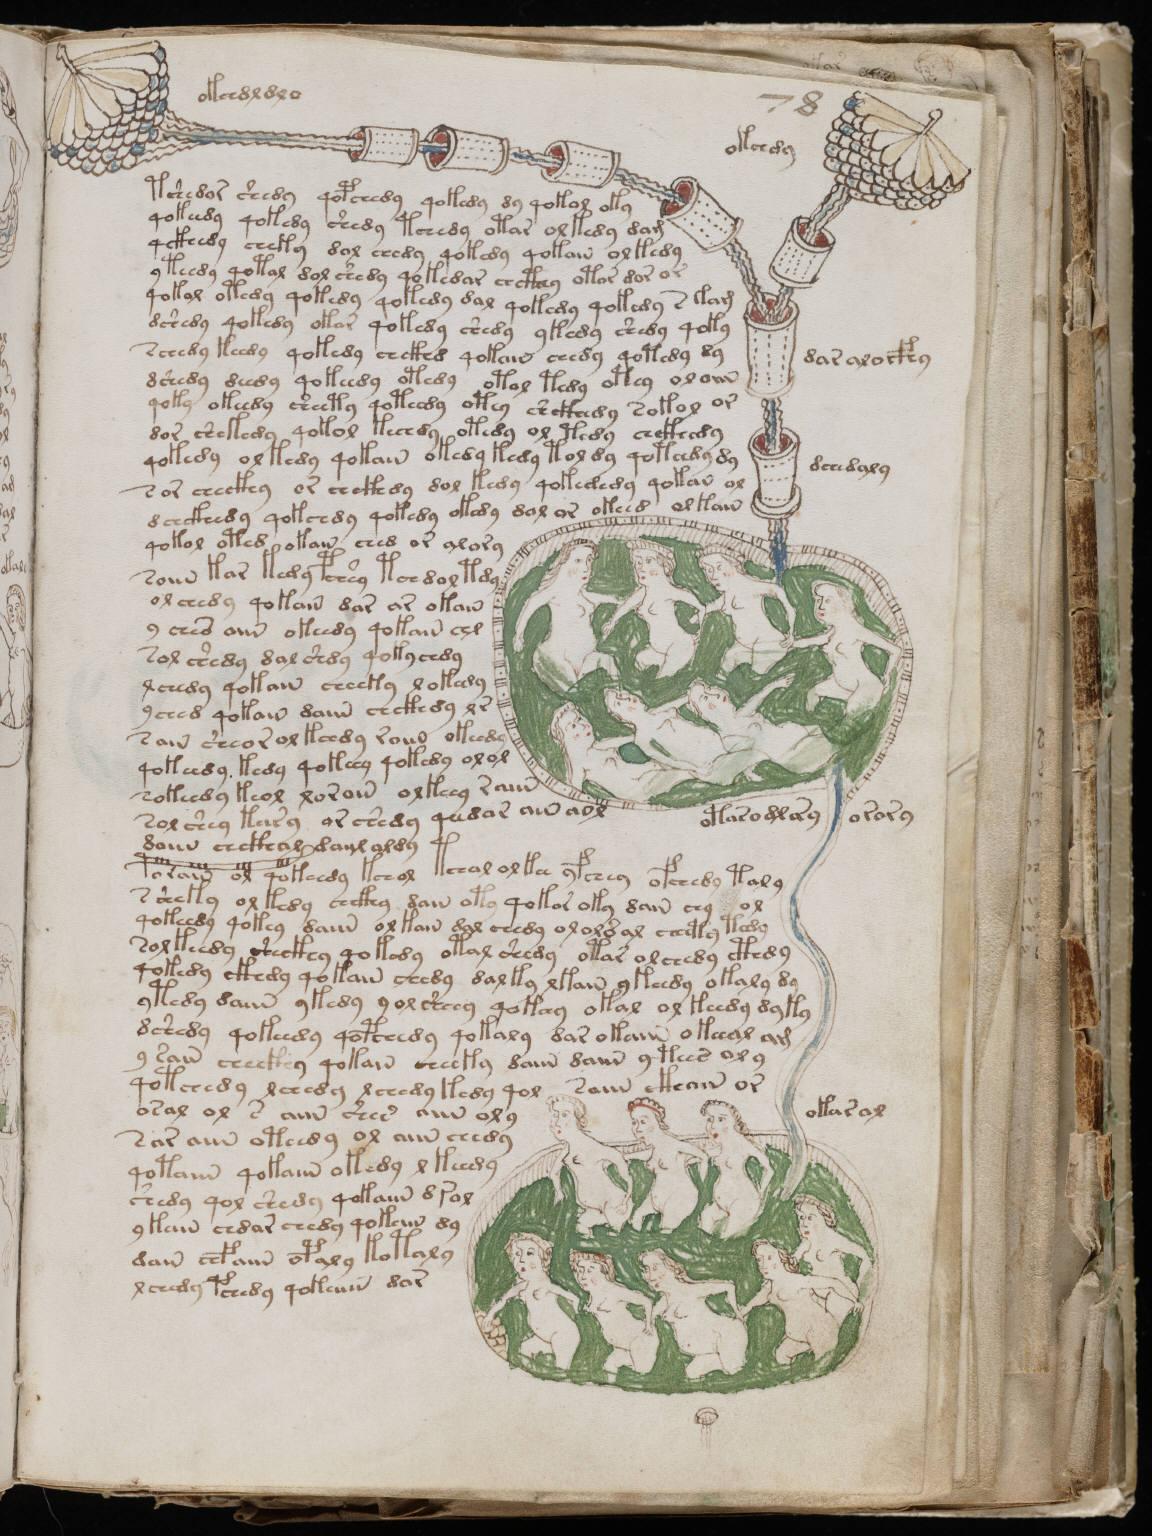 Voynich Manuscript %28141%29 ヴォイニッチ手稿(写本) どの言語にも属さない謎の文字!